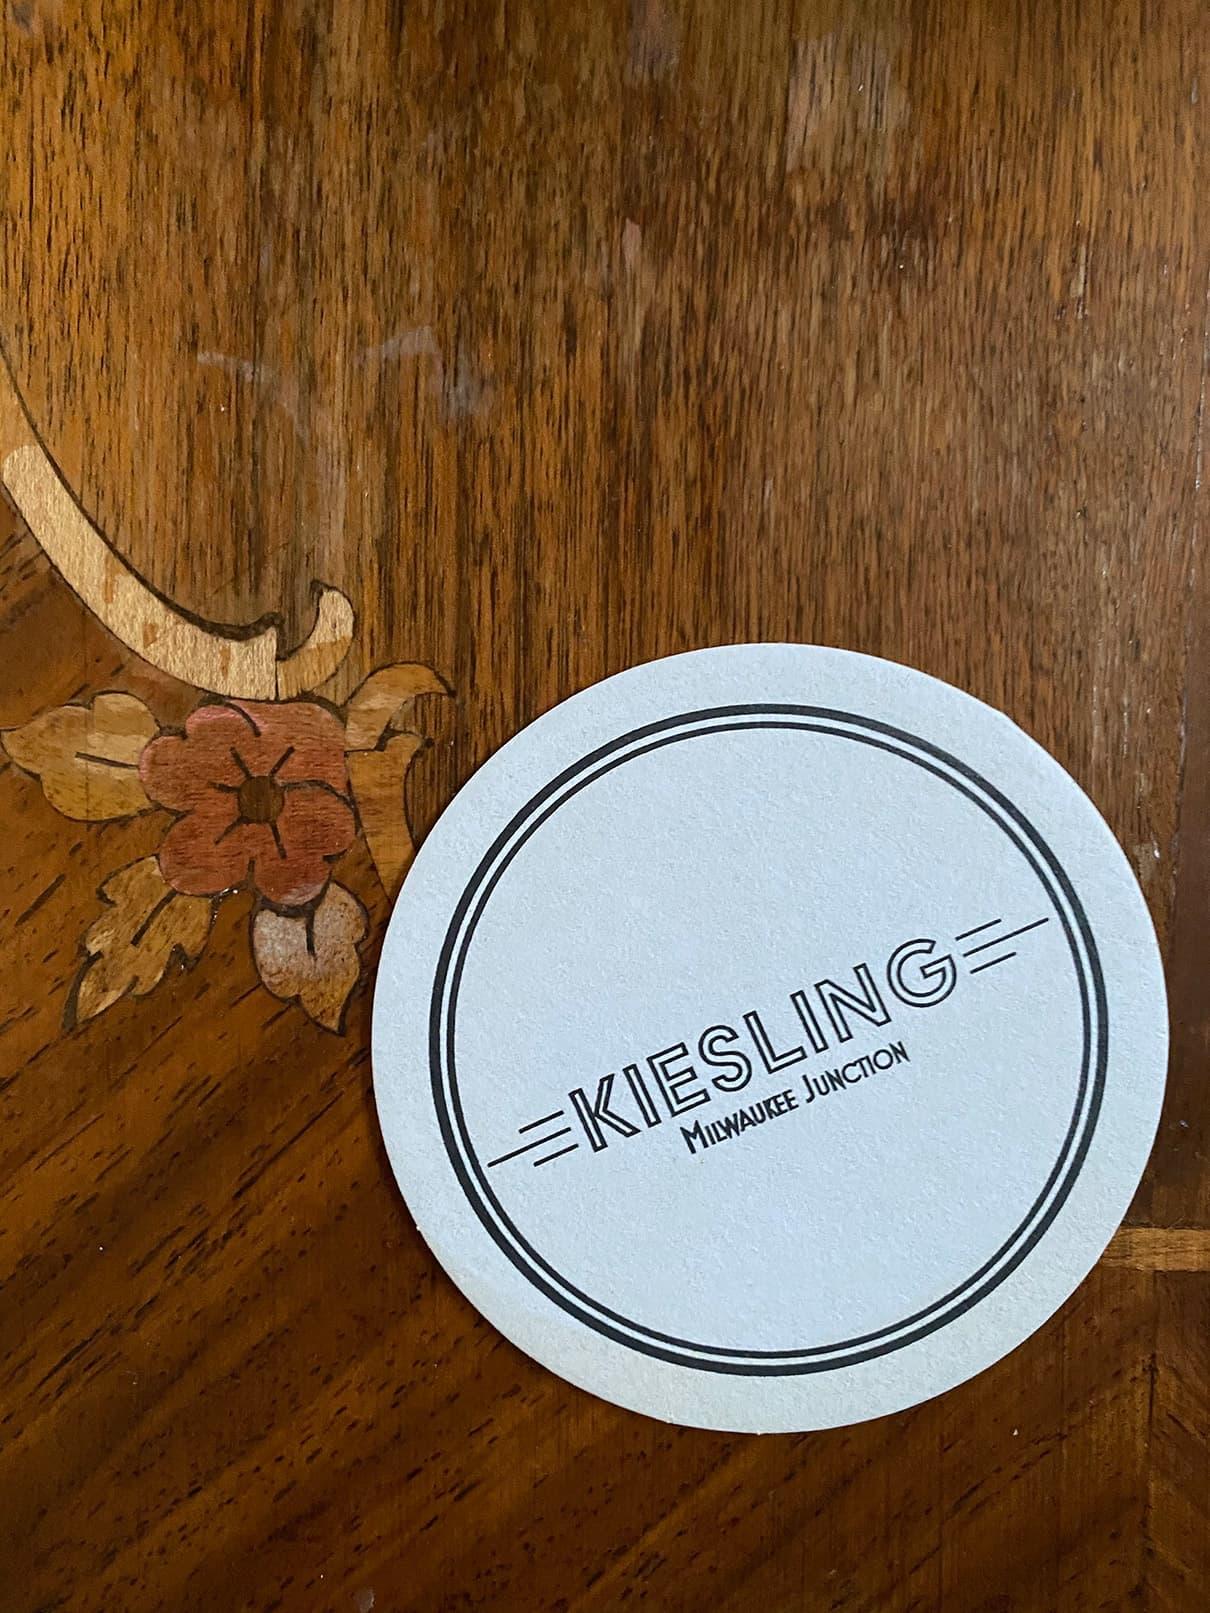 Kiesling-Coaster-Citizen